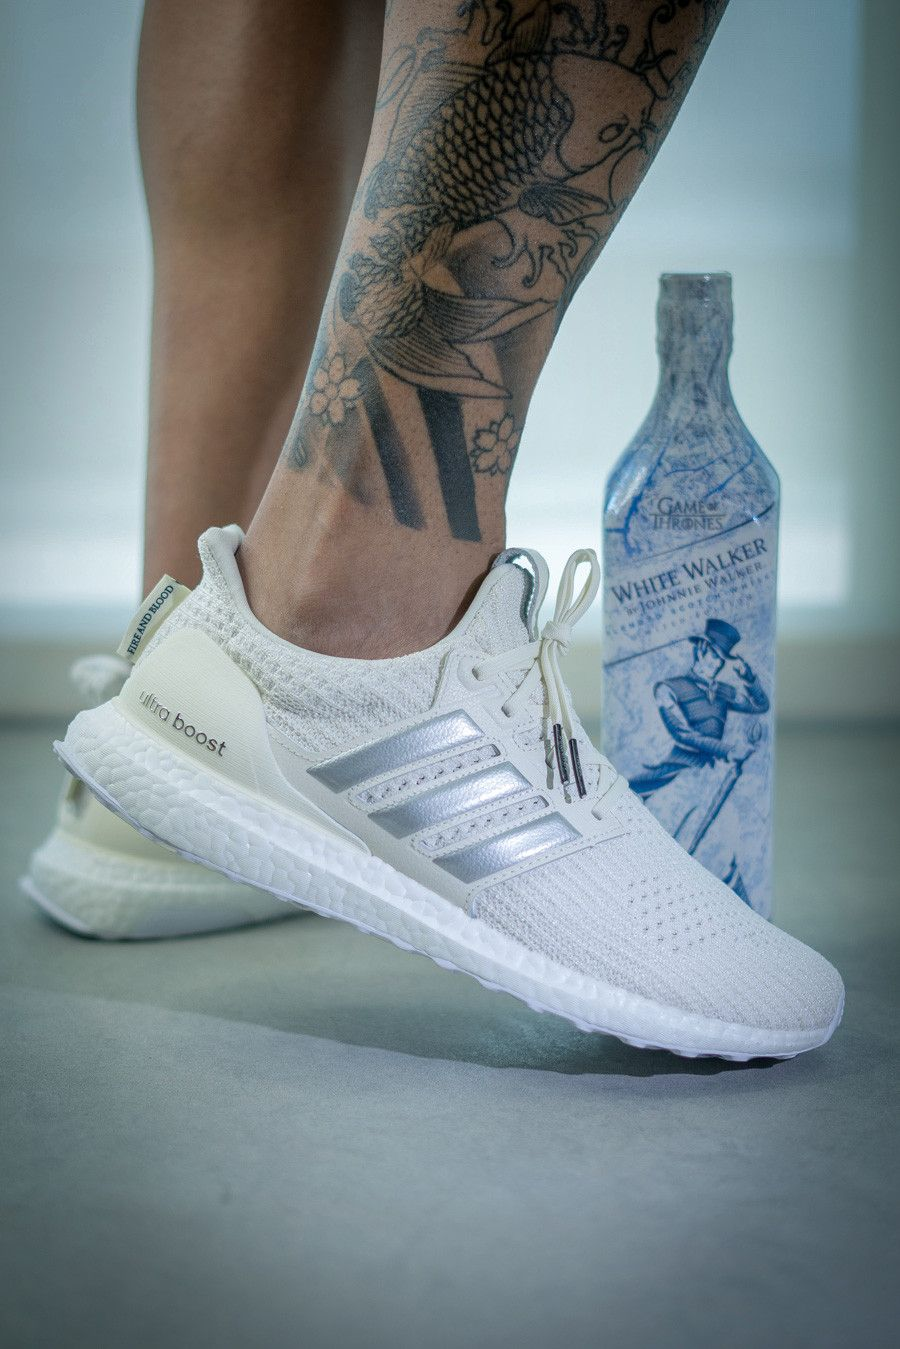 Adidas ultra boost, Adidas, Shoes mens